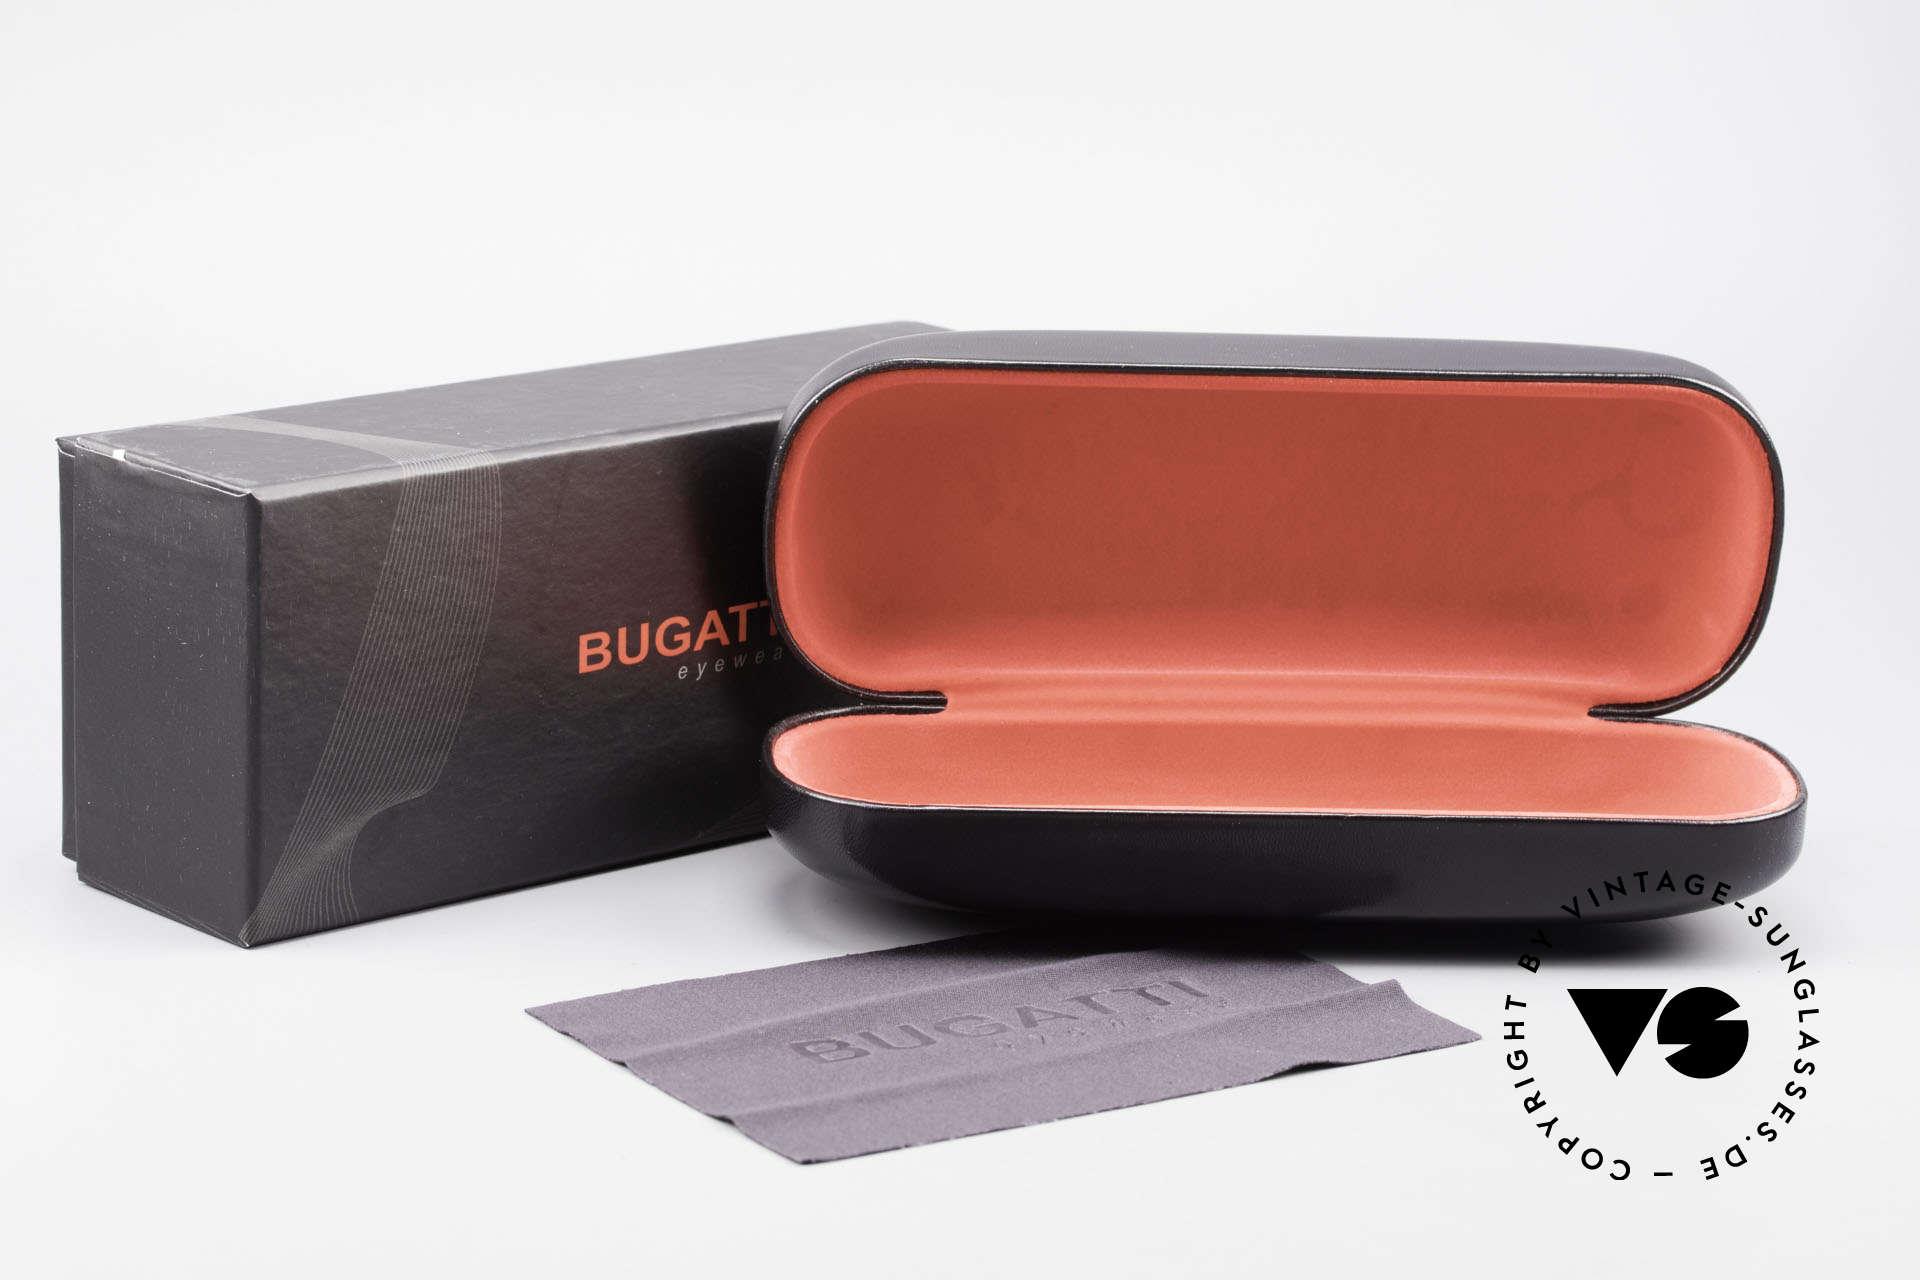 Bugatti 326 Odotype Rare Designer Eyeglass-Frame, Size: medium, Made for Men and Women